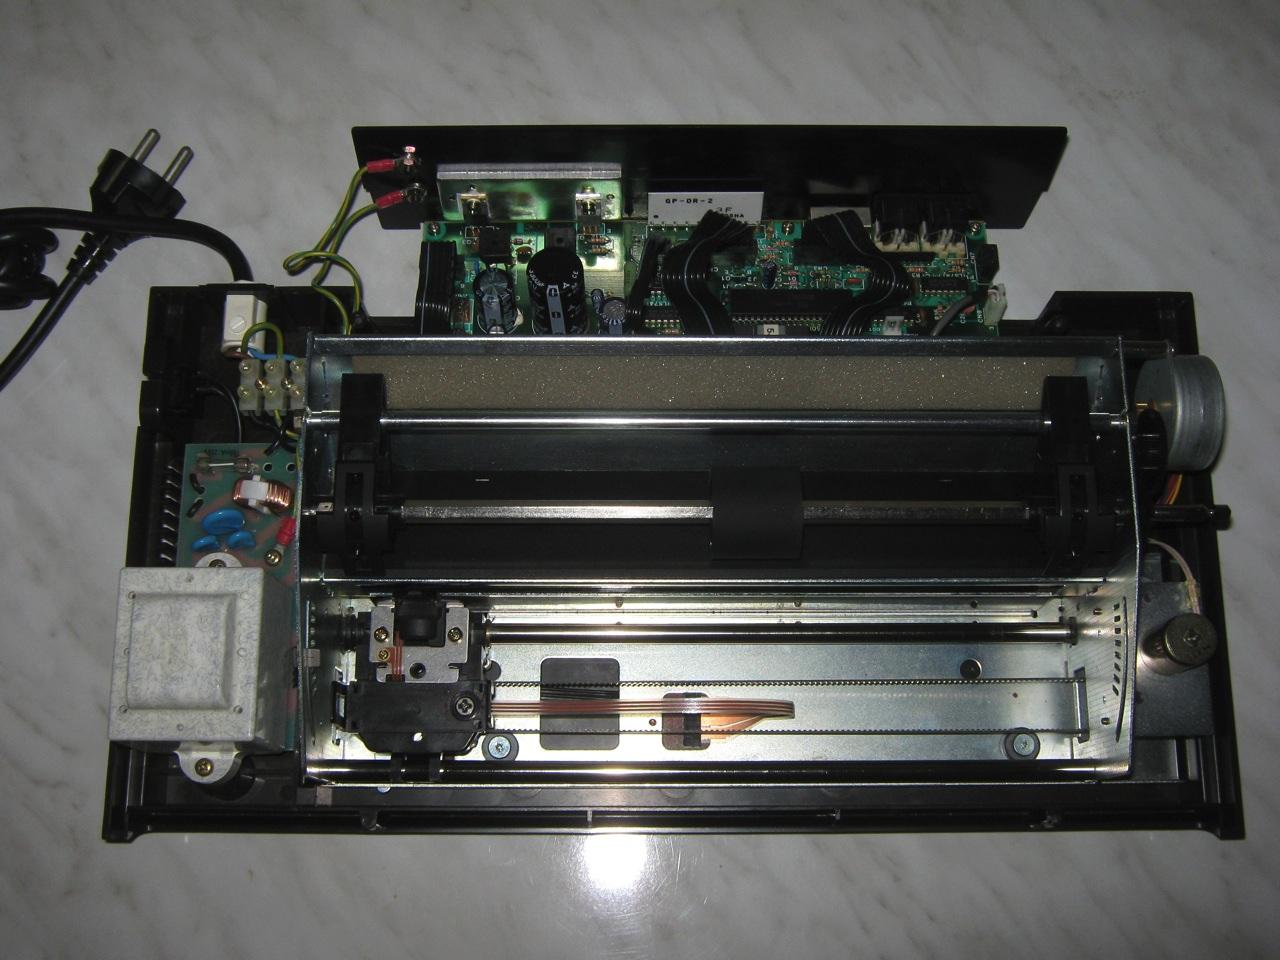 printers nightfall blog retrocomputermaniacom